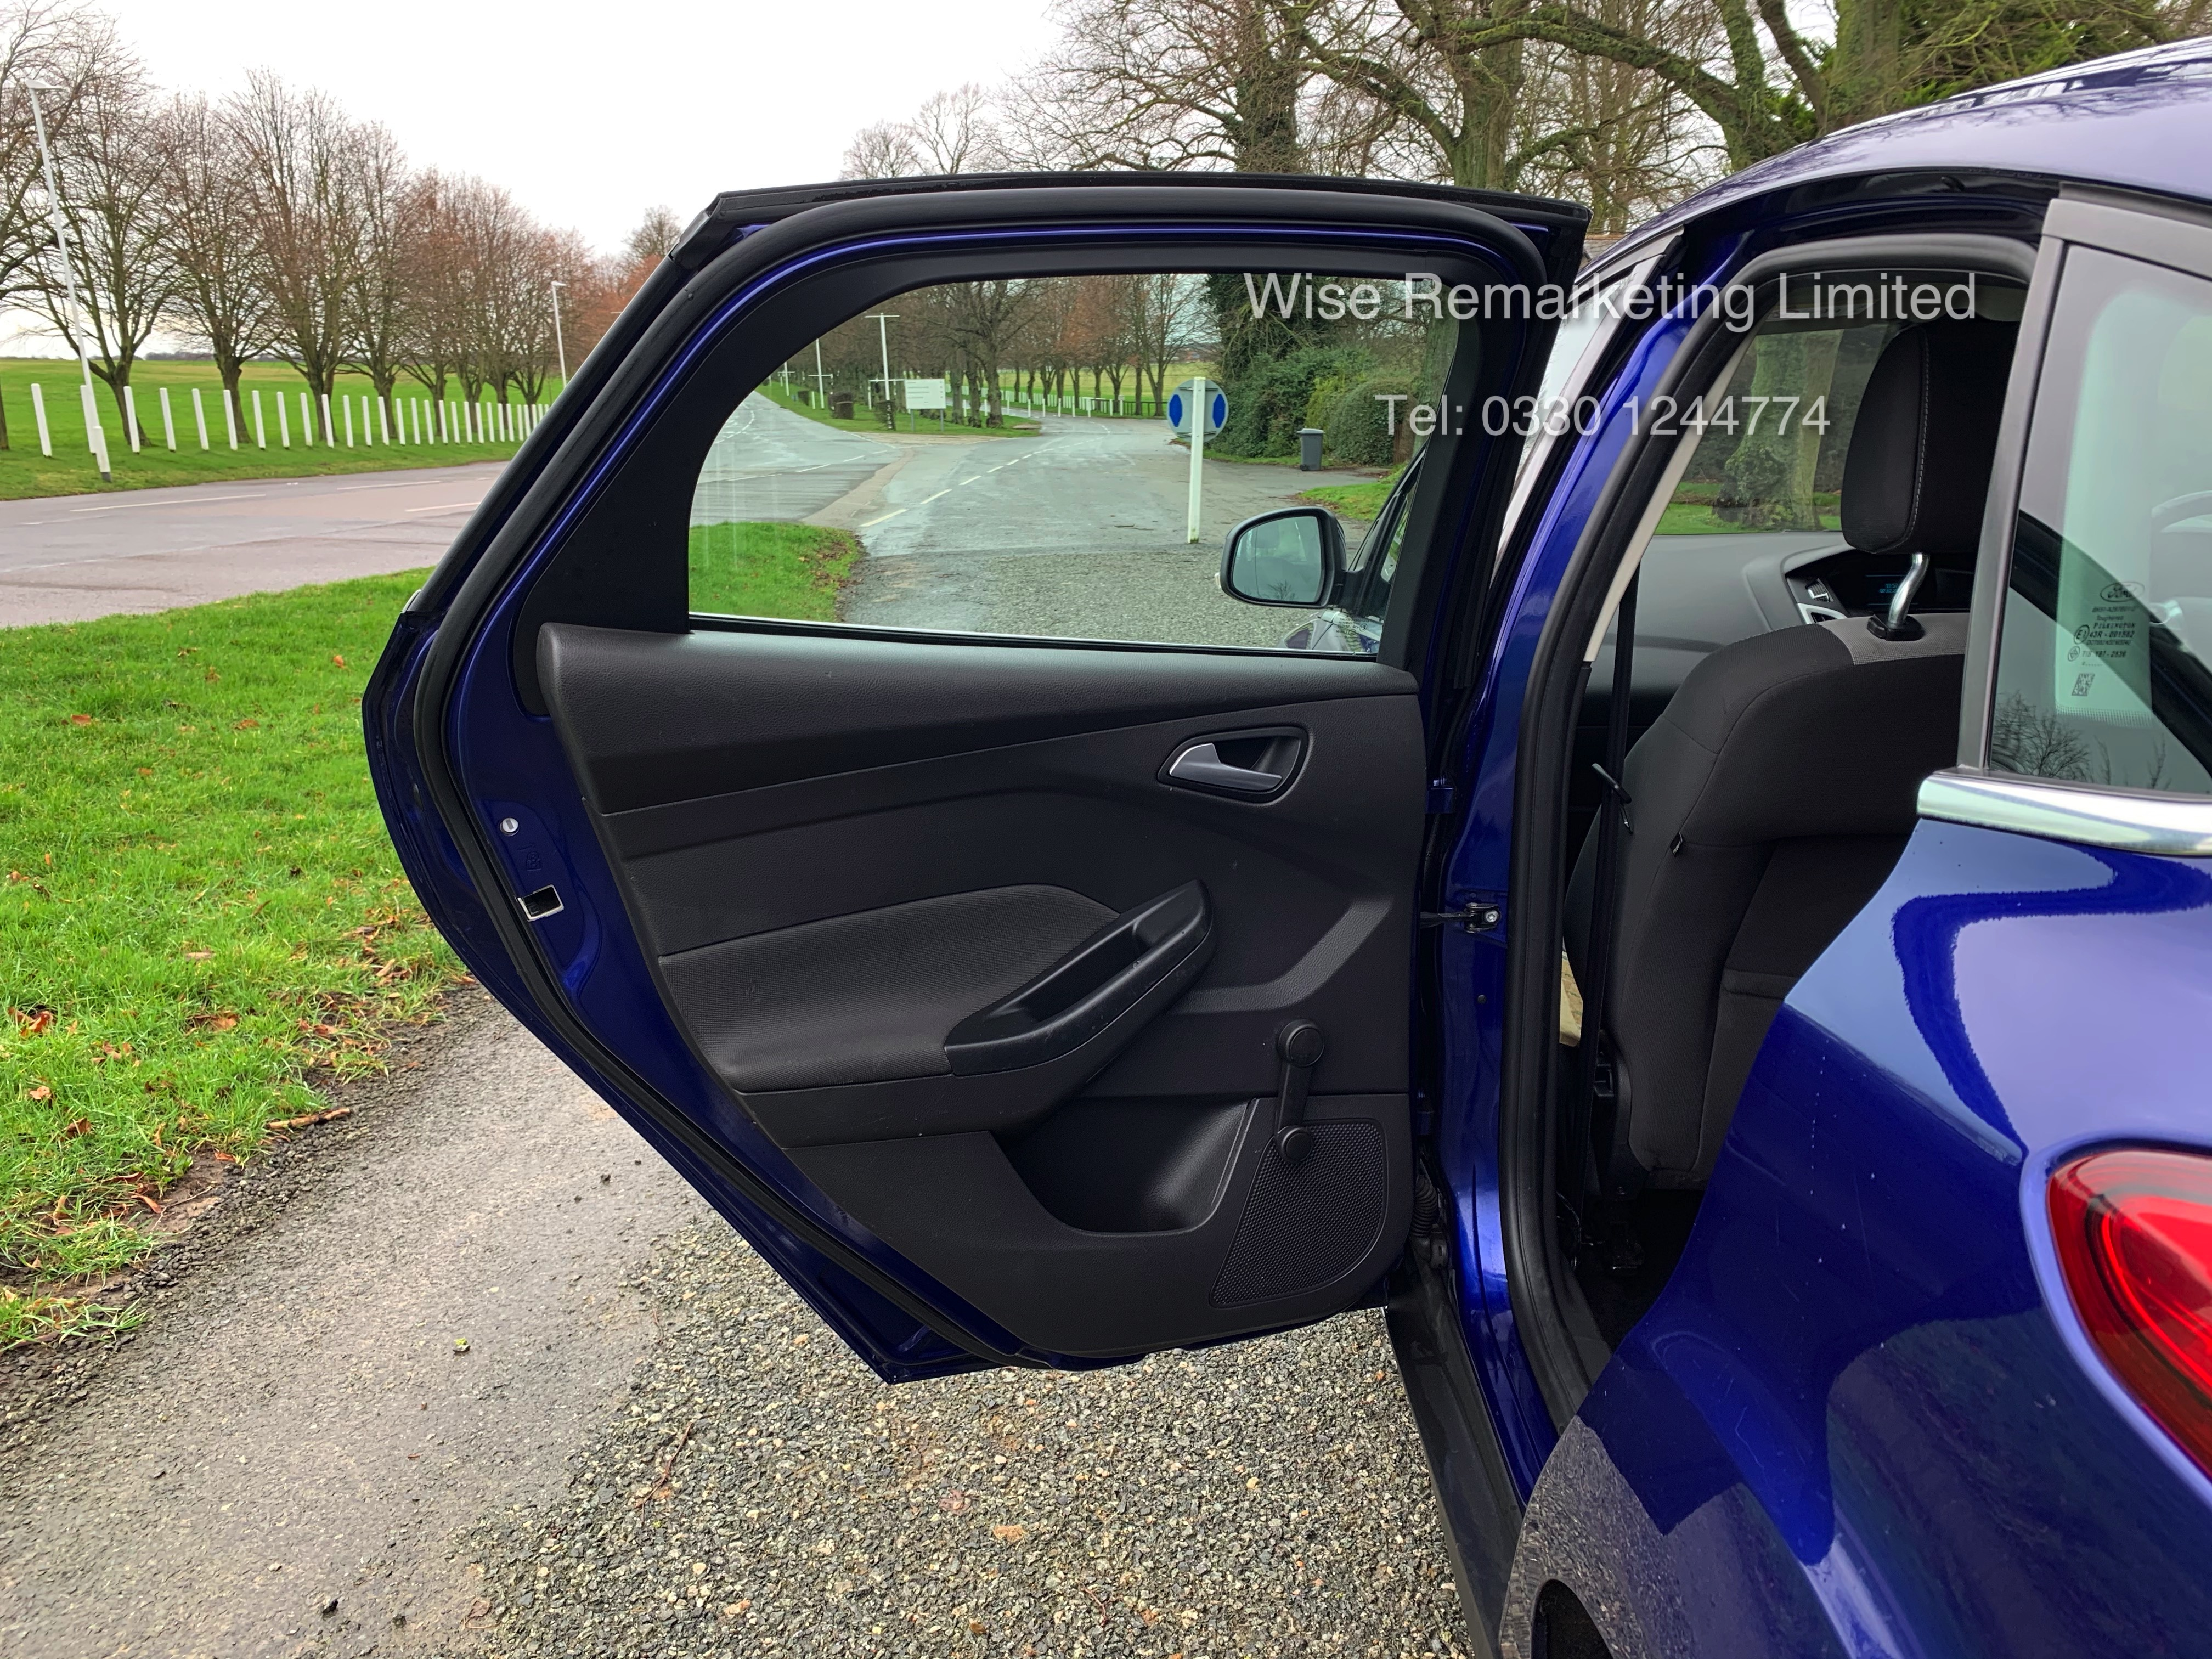 Ford Focus Zetec 1.6 TDCI Econetic - 2015 Model - 6 Speed - - Image 10 of 20